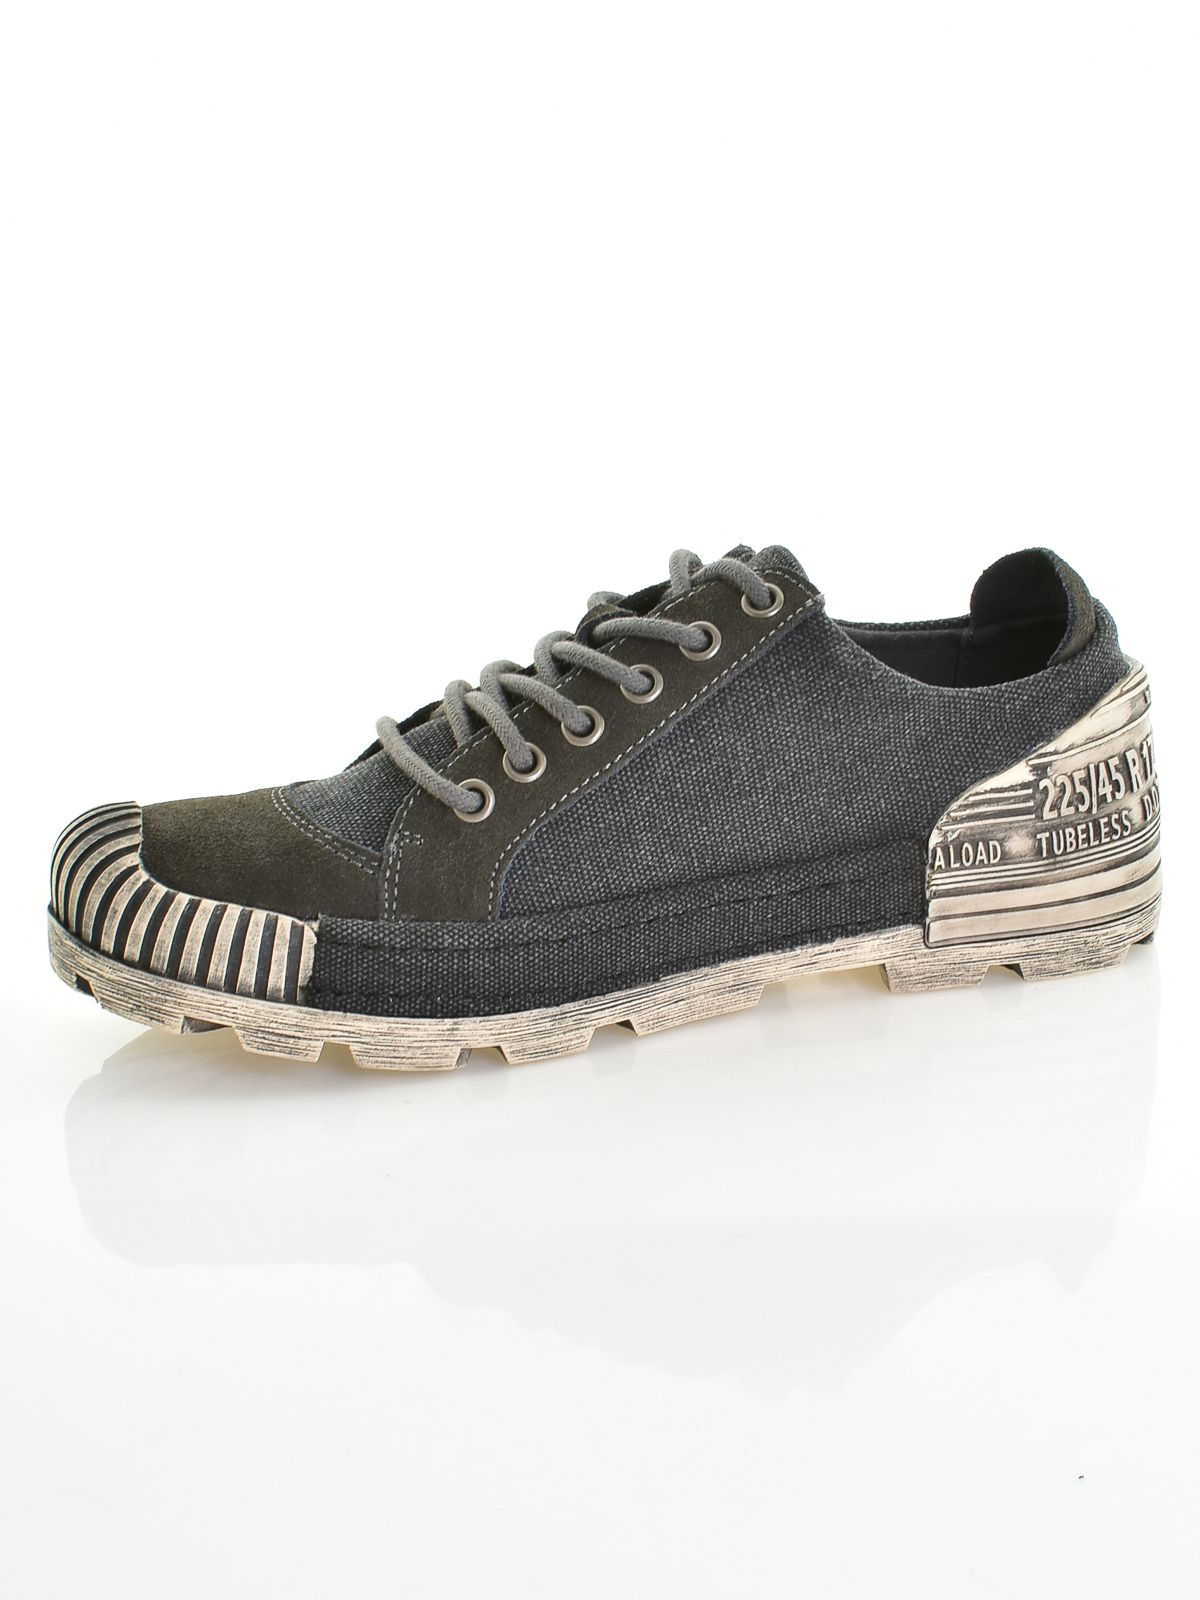 04eda1995b Devergo férfi cipő CENAS | Markasbolt.hu Hivatalos DEVERGO forgalmazó